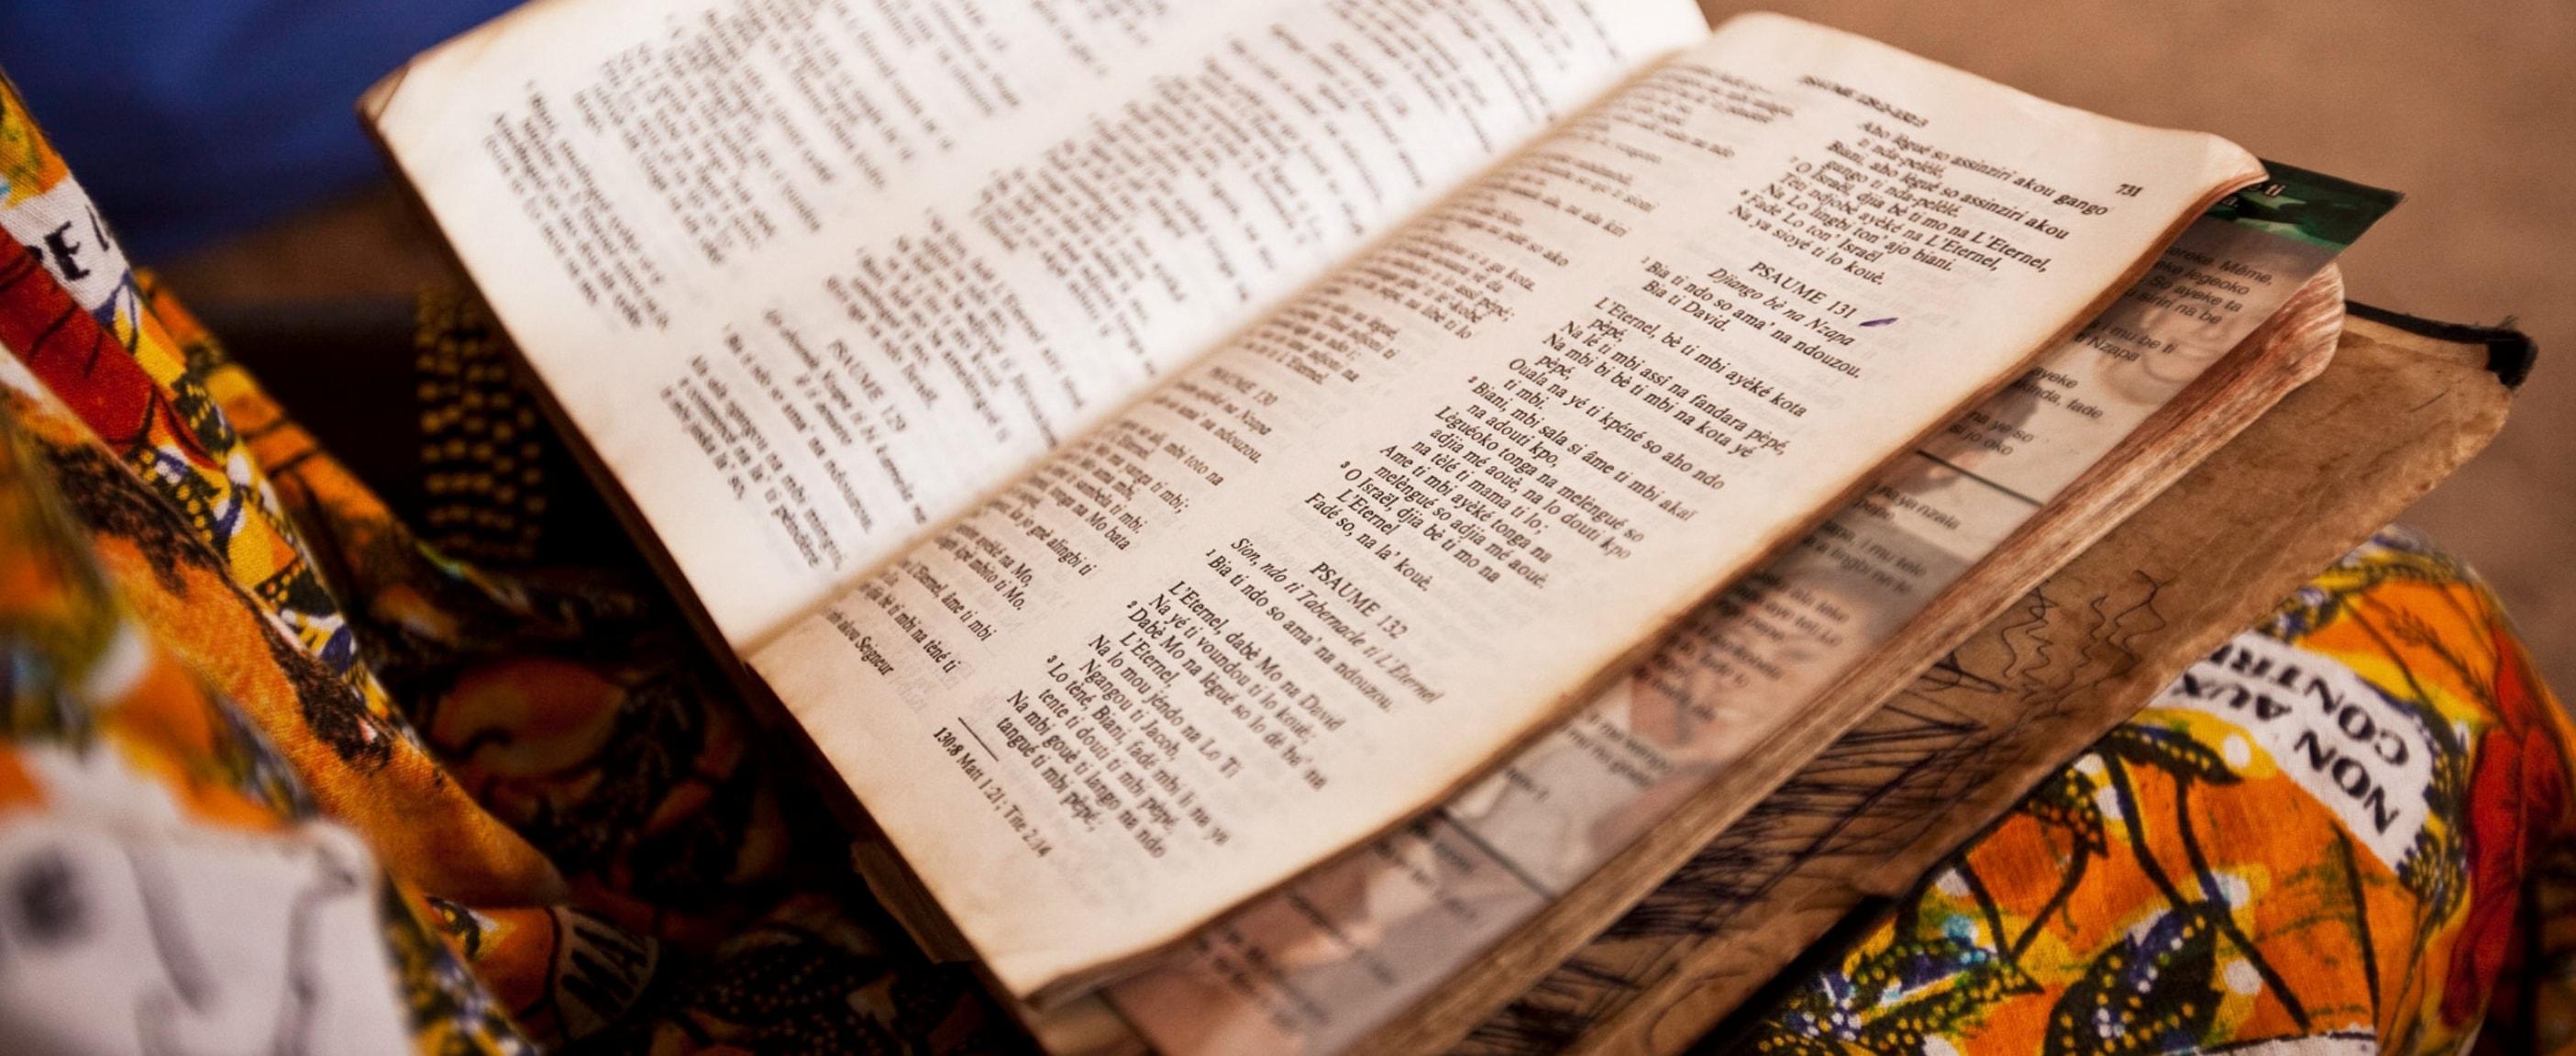 Bibeloversettelse